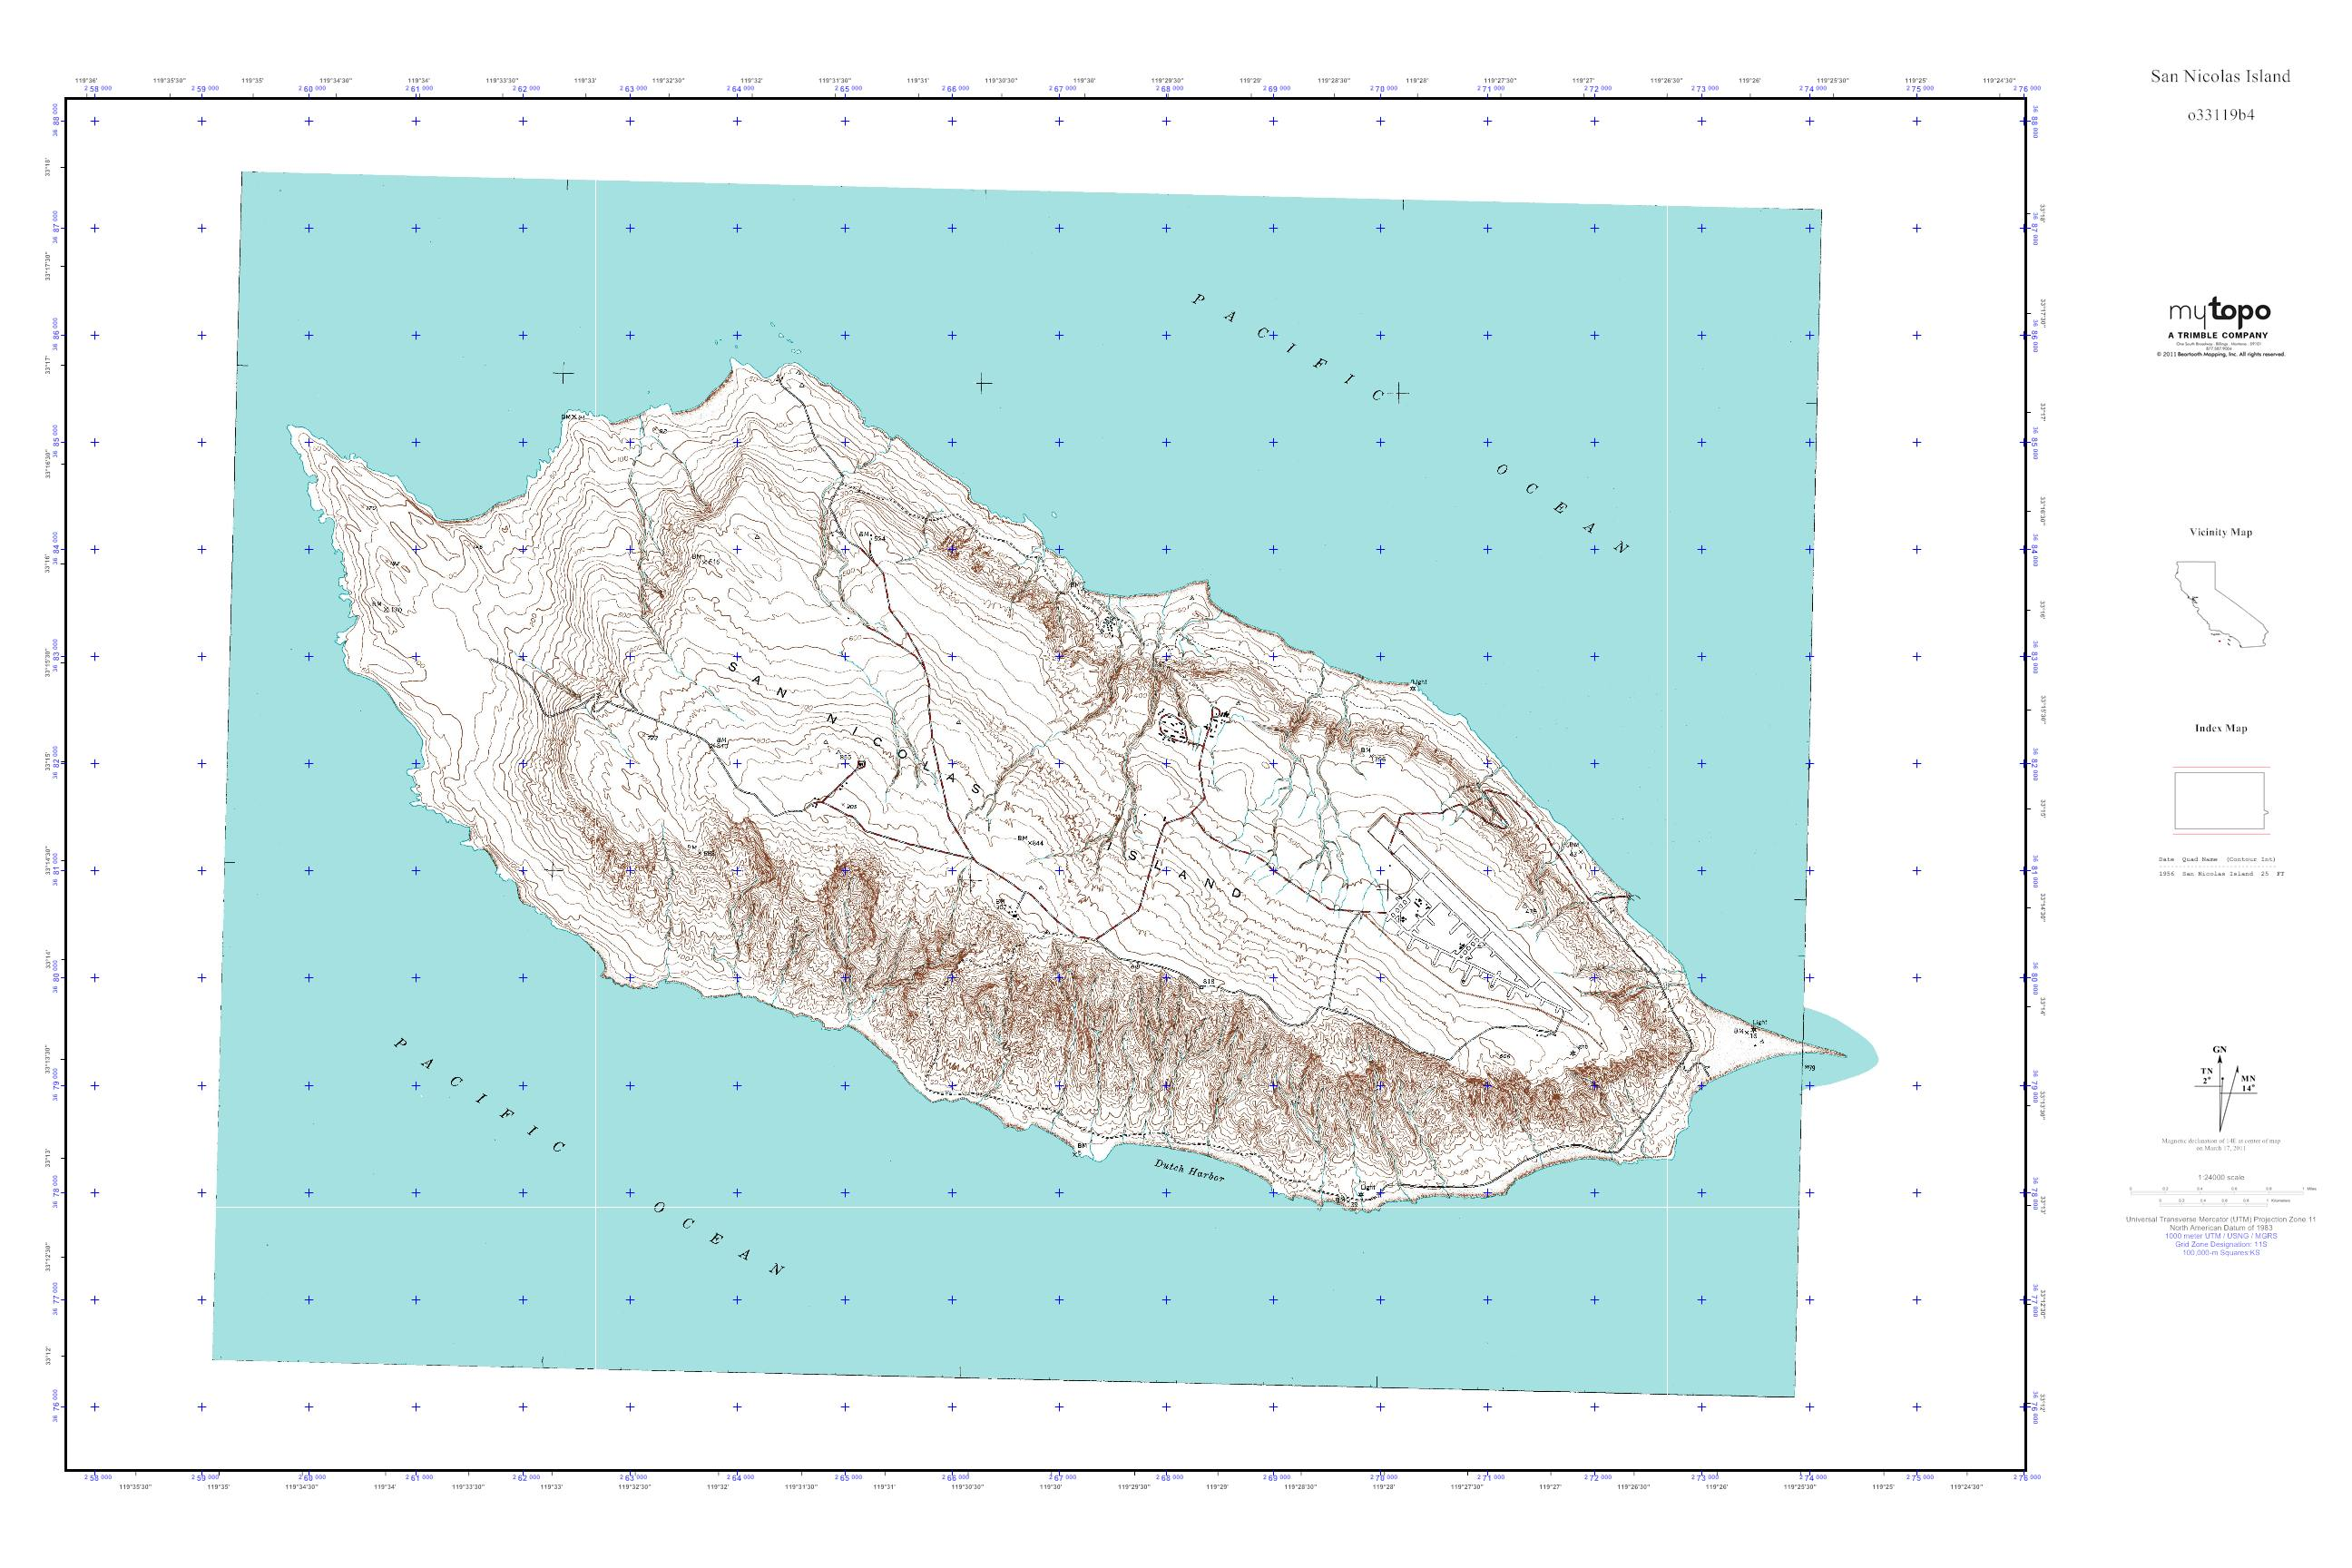 MyTopo San Nicolas Island California USGS Quad Topo Map - Map of san nicolas island and us